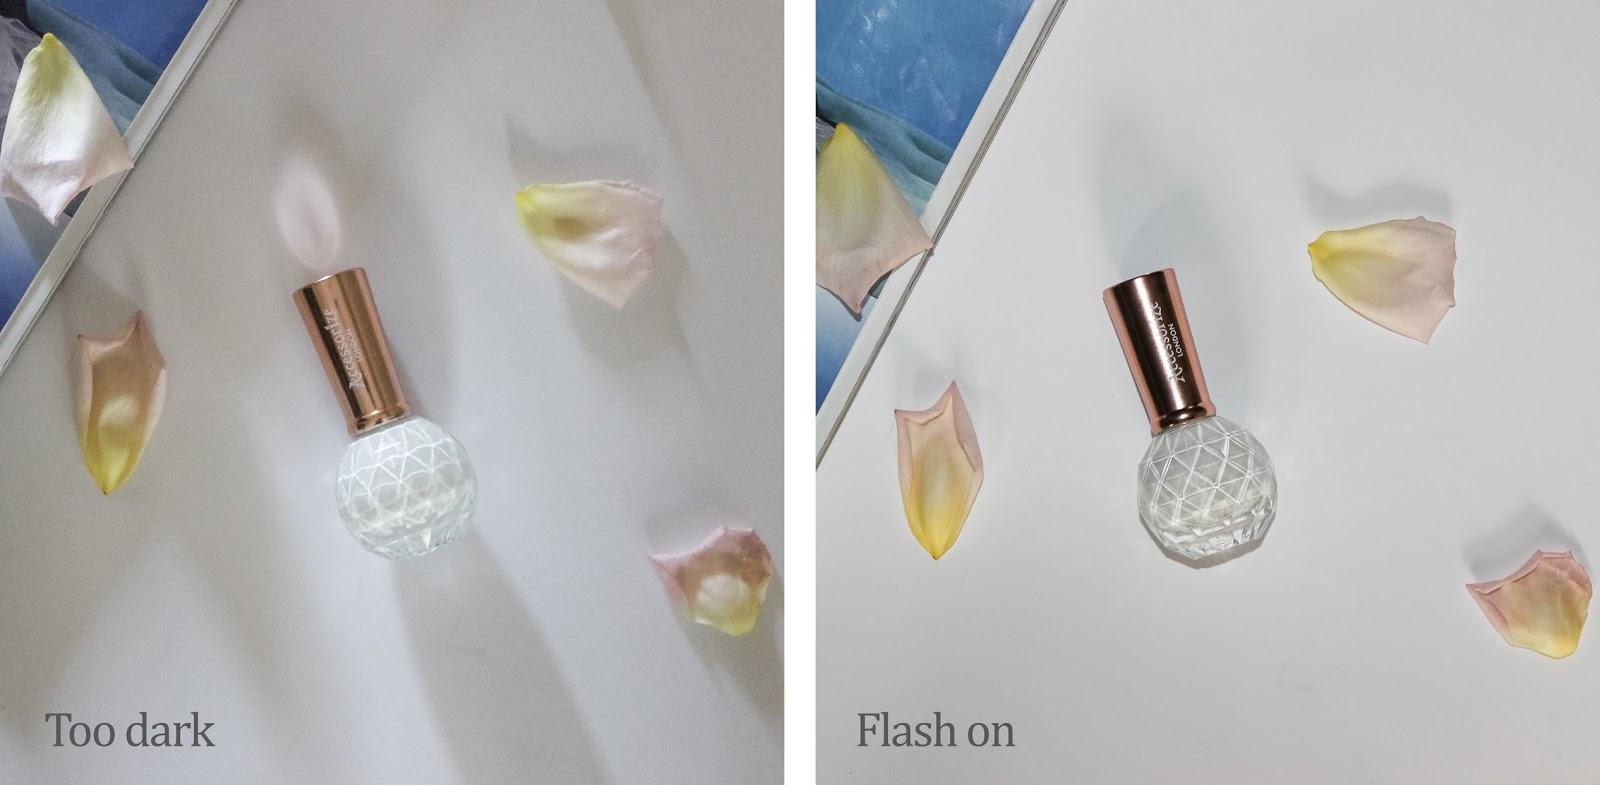 How To Take High Quality Blog Photos - Lighting